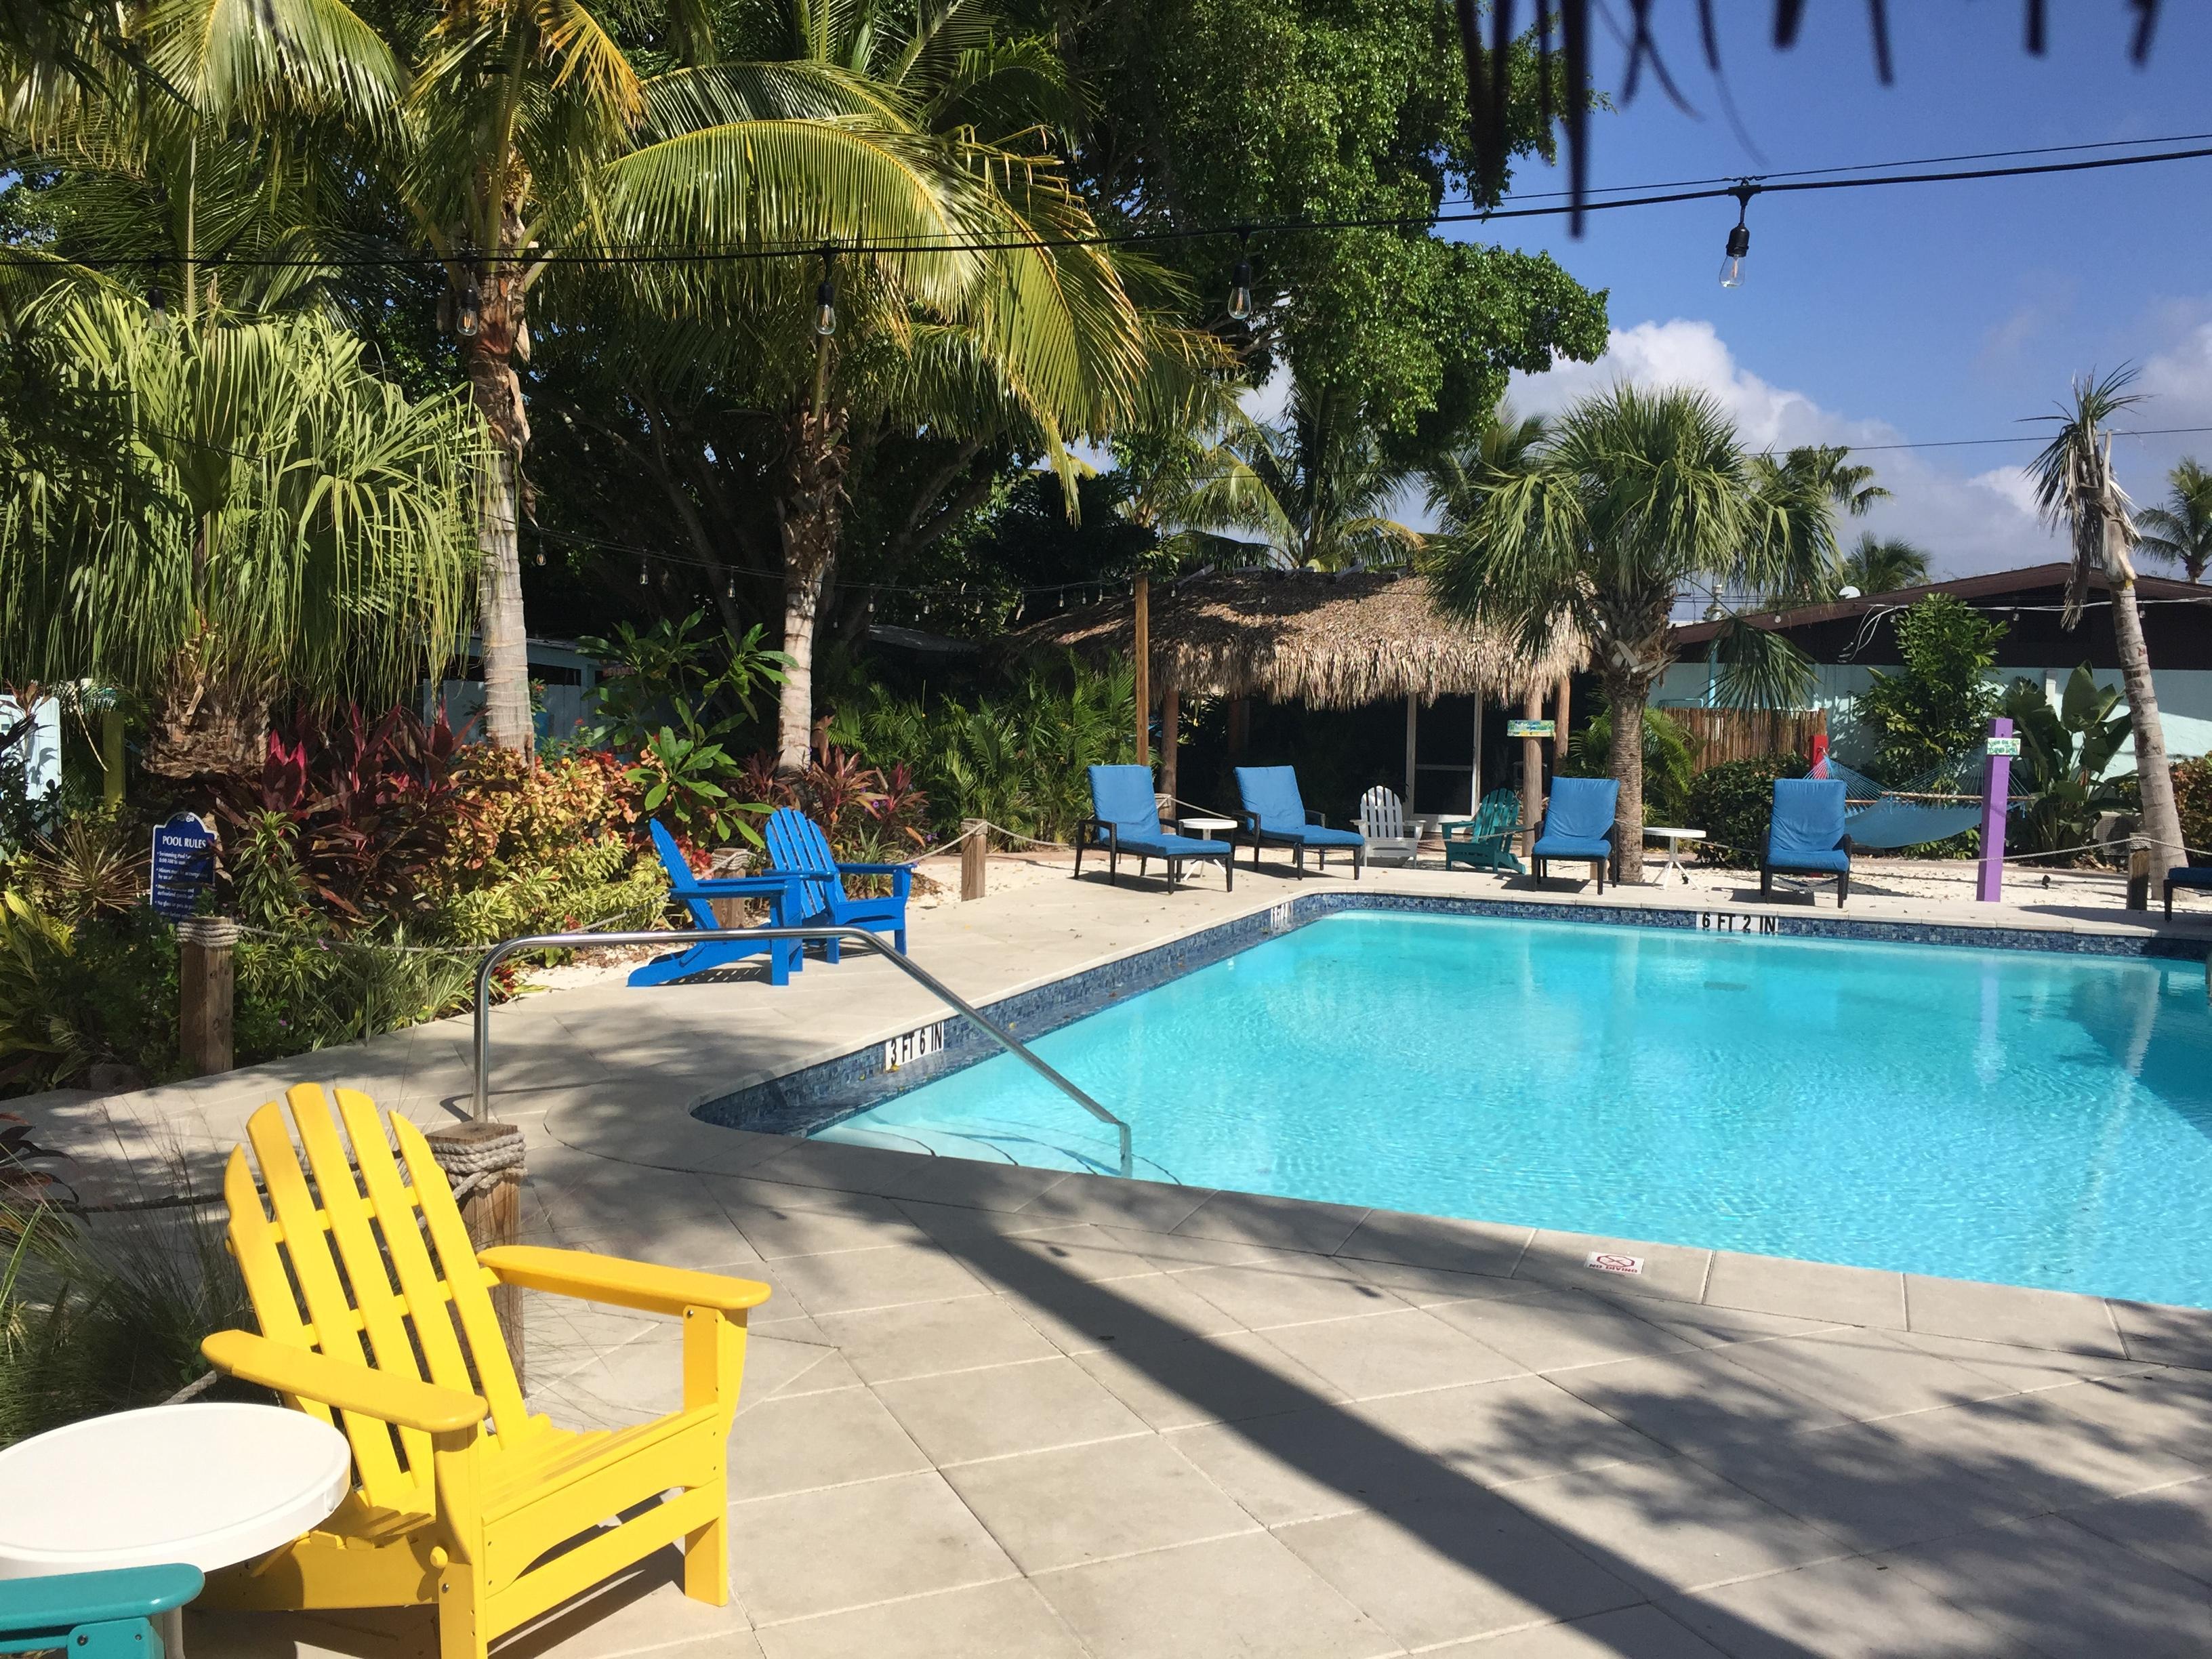 Siesta Key Palms Hotel In Sarasota Hotel Rates Reviews On Orbitz